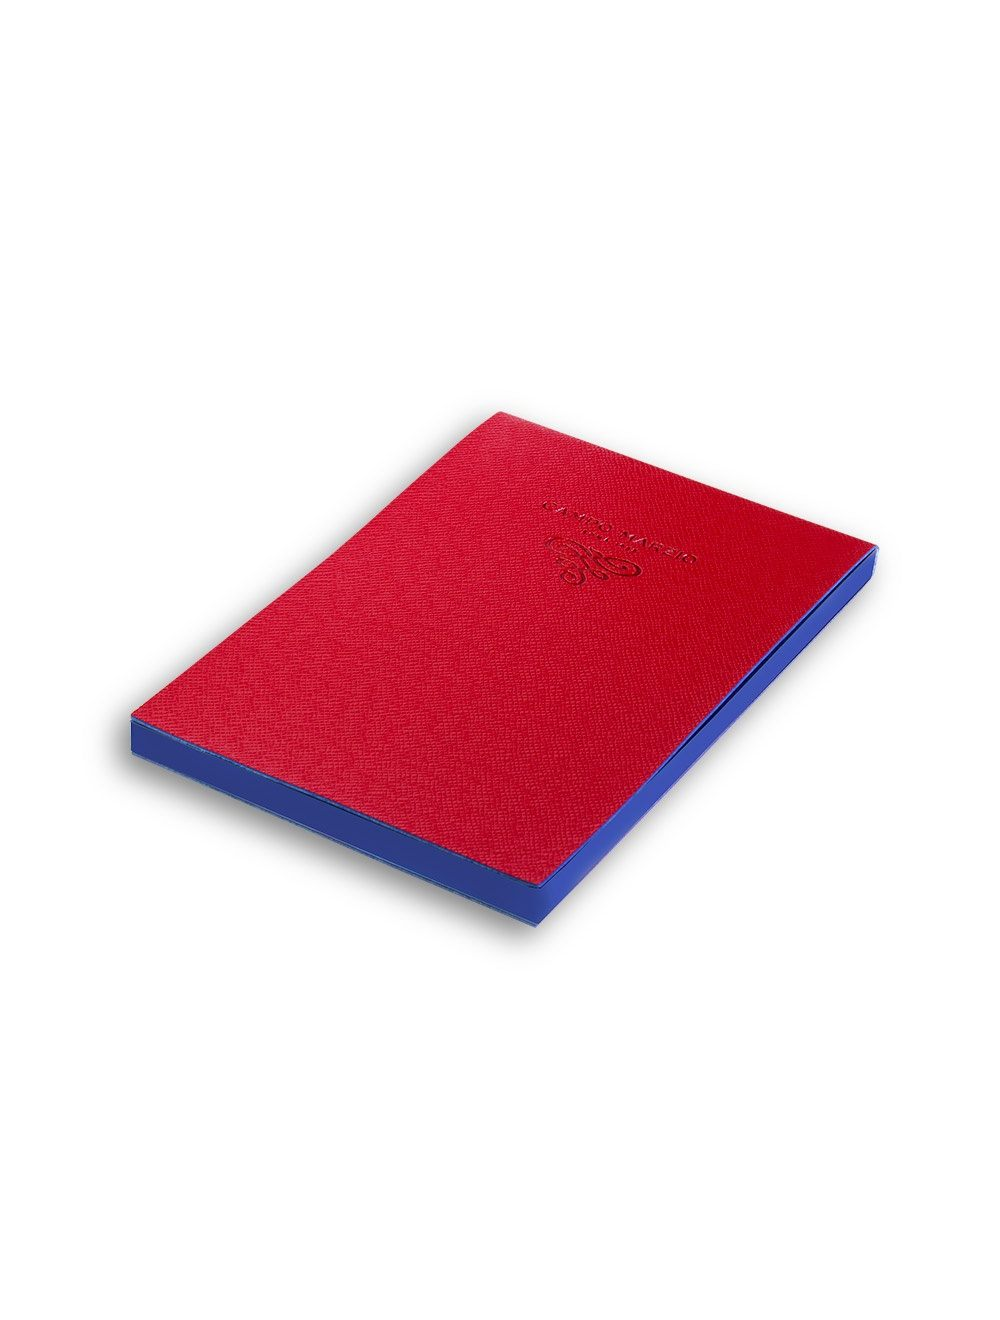 Notes 11x16 cm Saffiano - Cherry Red